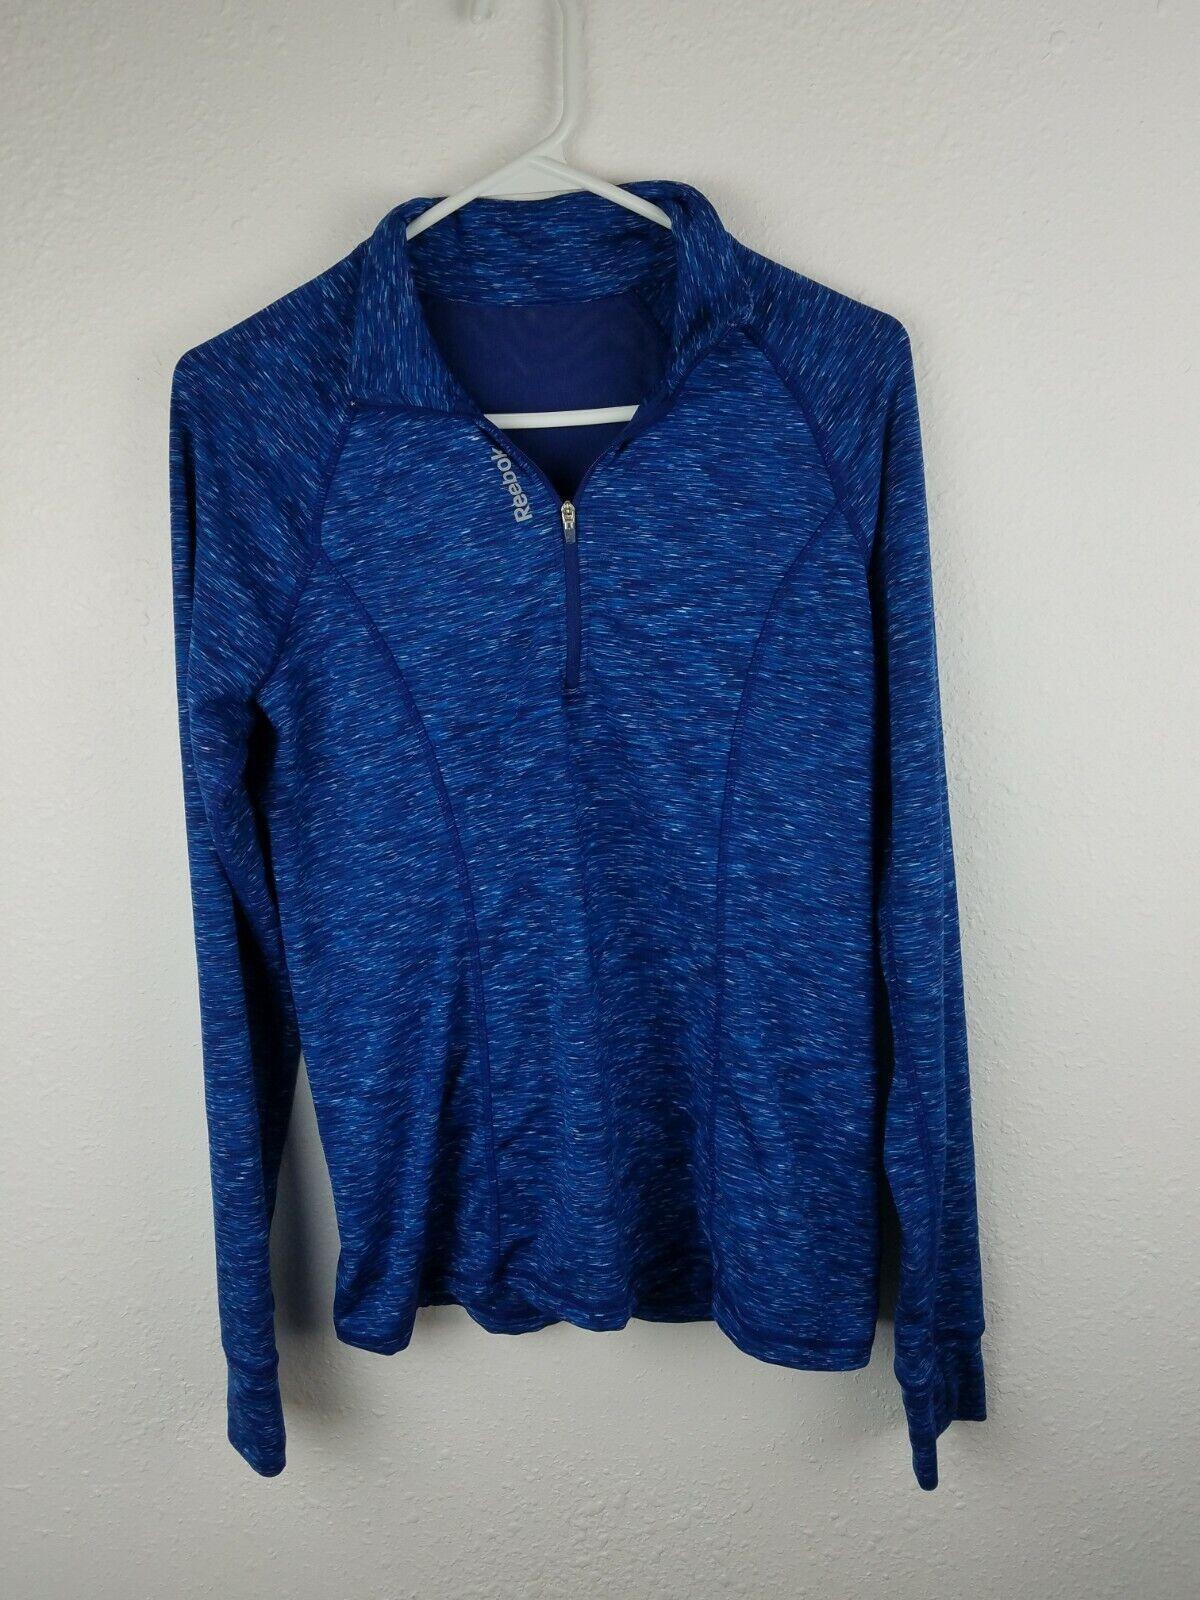 Reebok Womens 1/4 Zip Pullover SZM Blue Space Dye Thumbholes Mesh Insert A19